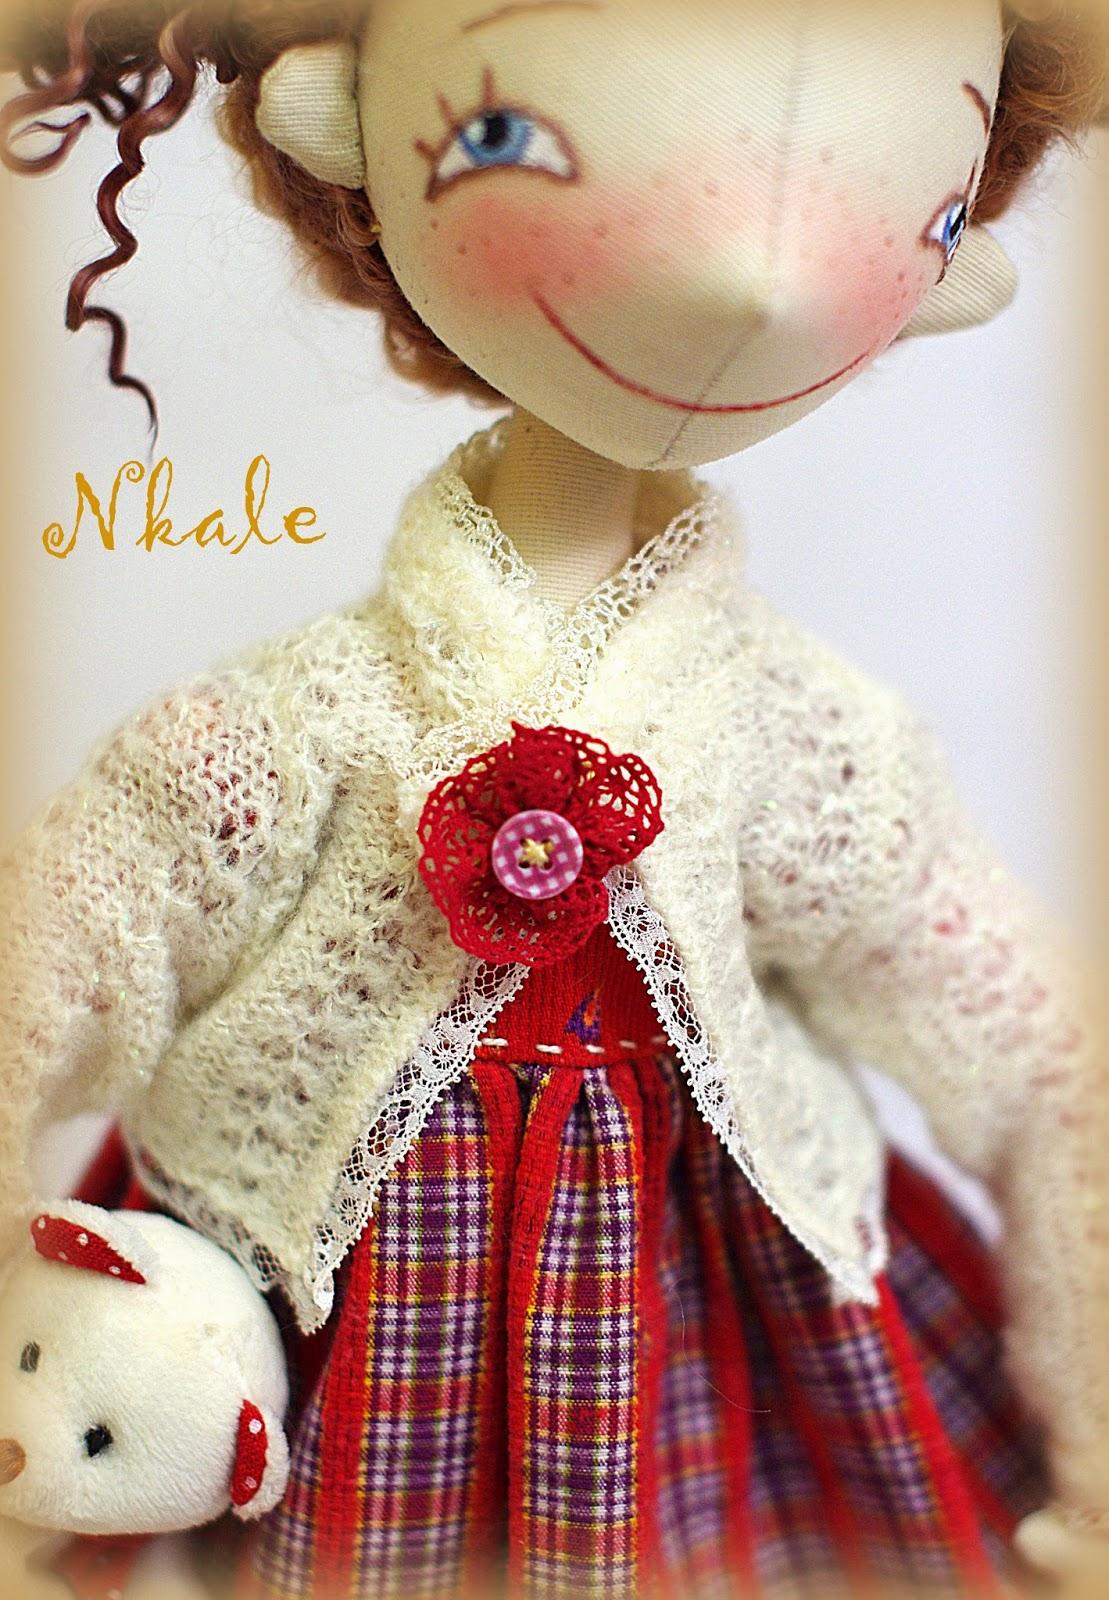 Шитье мастер класс челябинск кукла nkale  #4